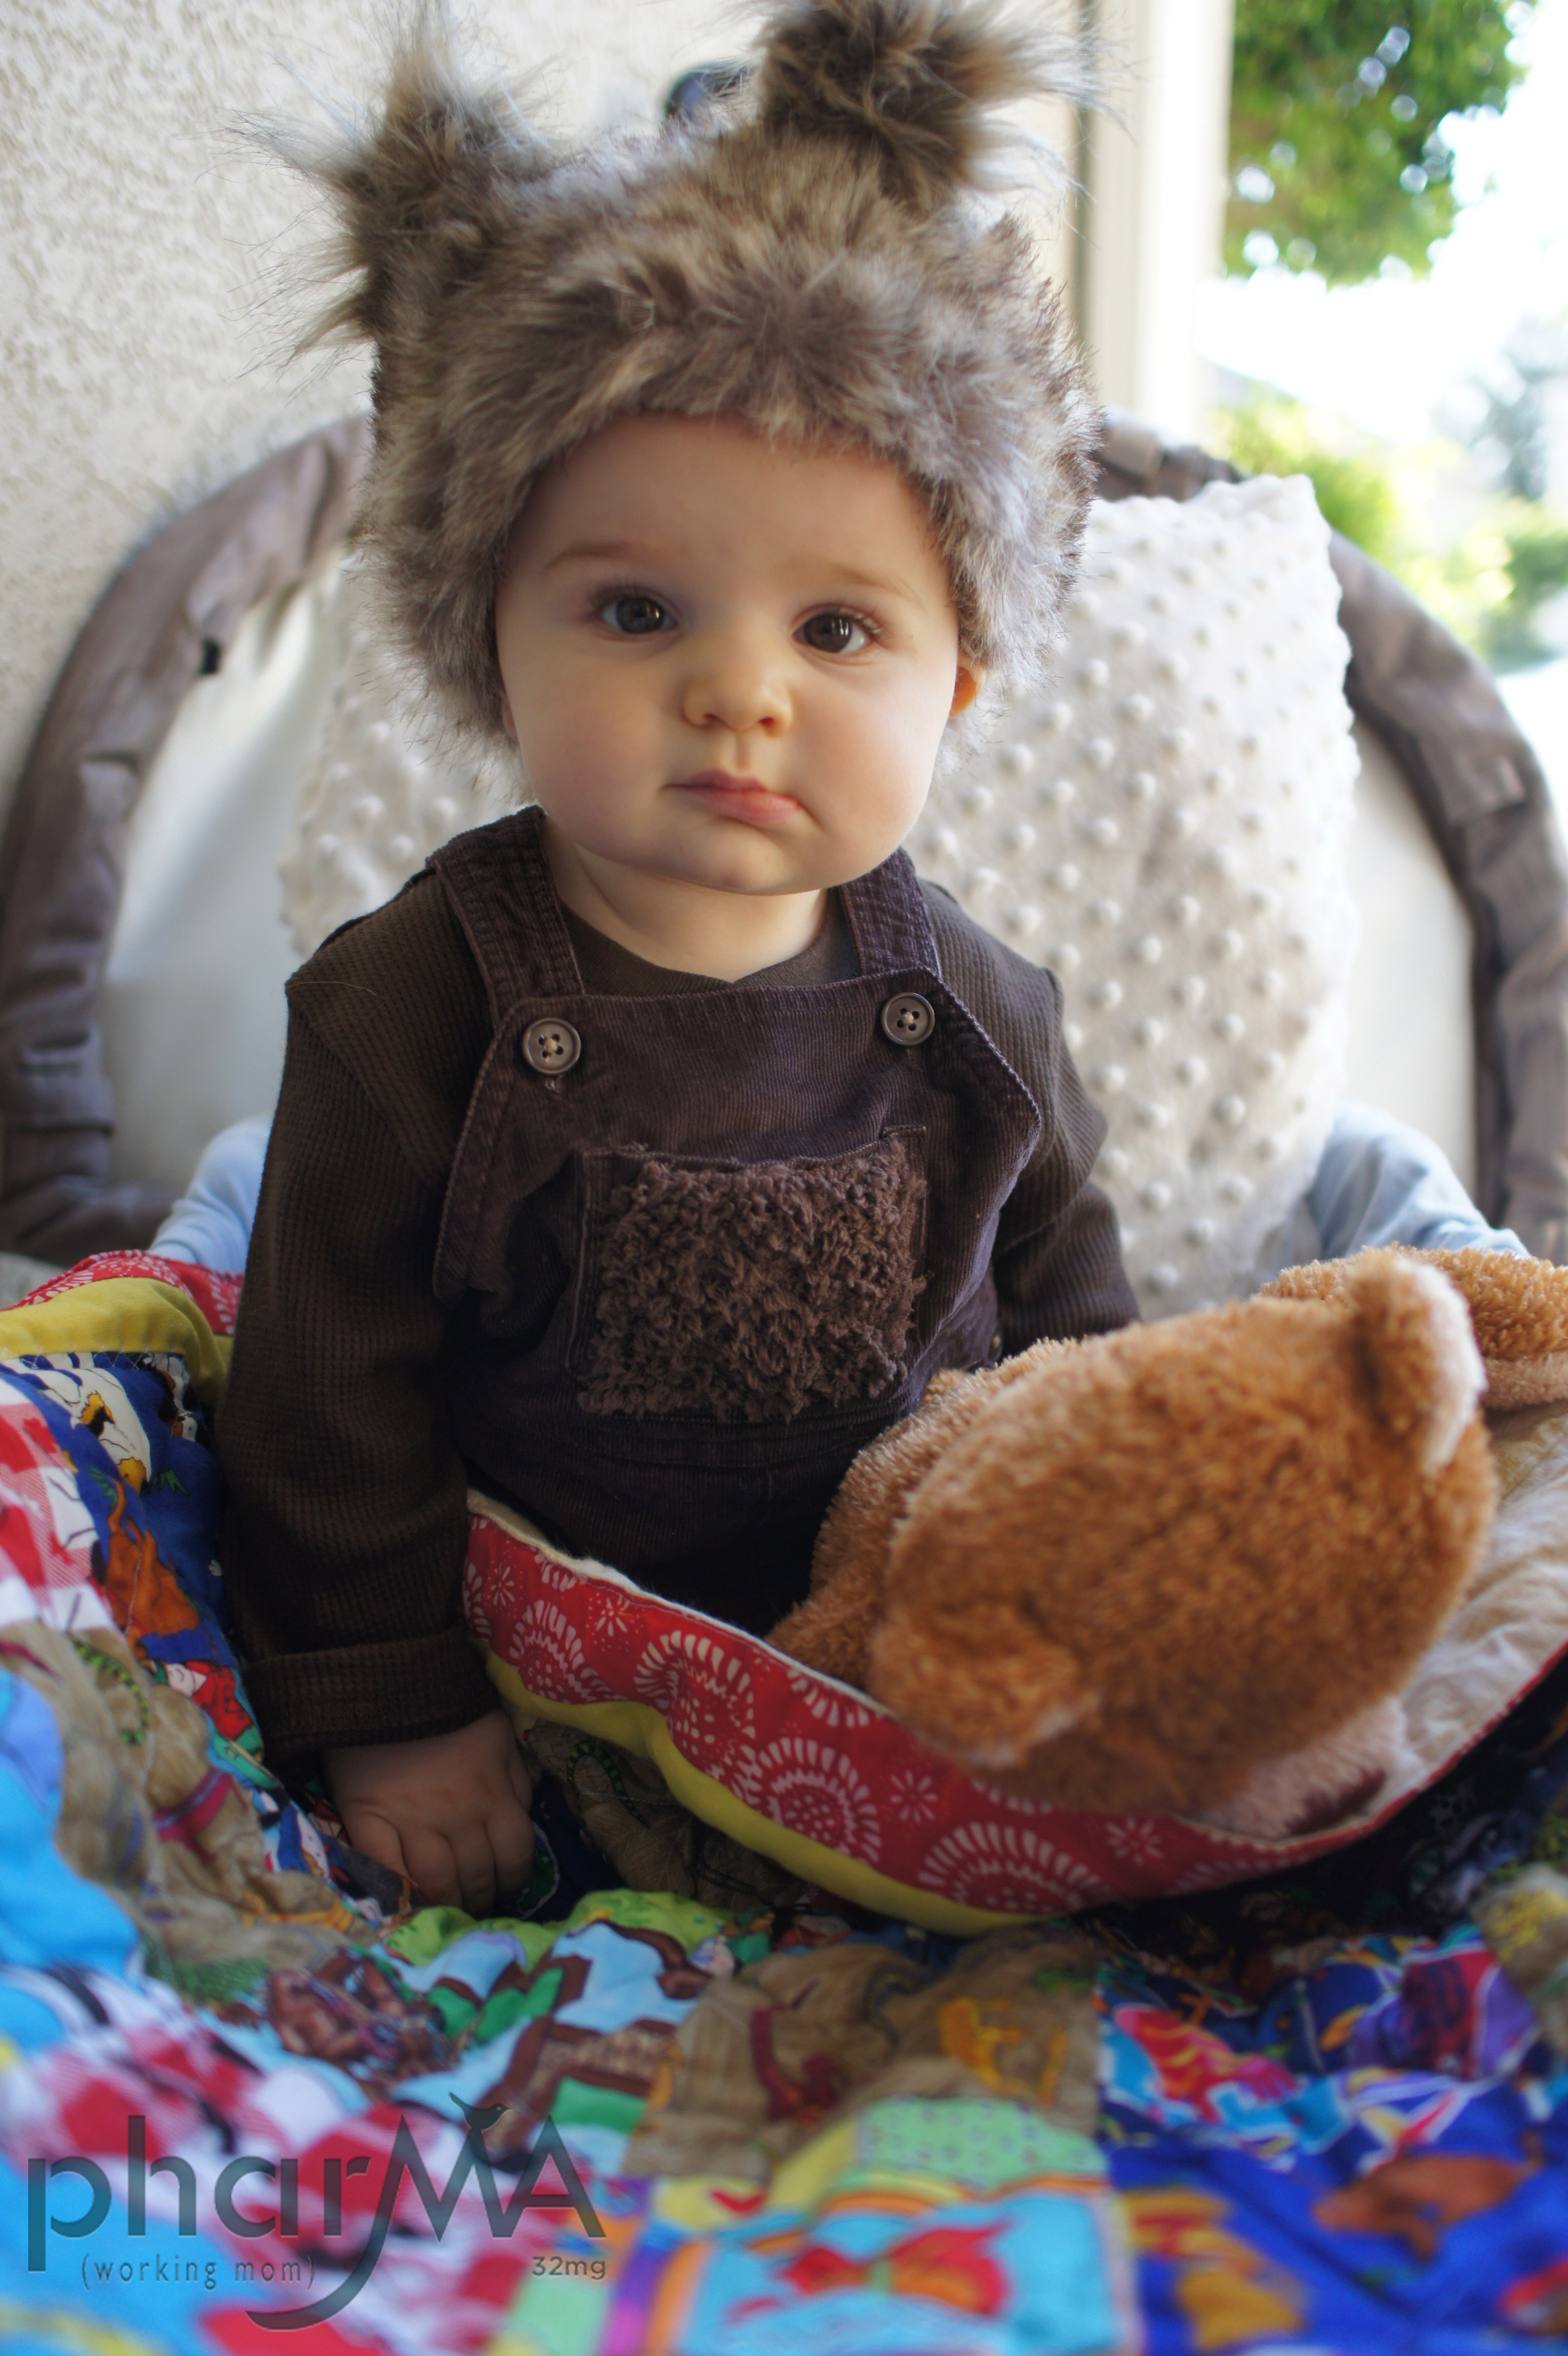 Best ideas about DIY Teddy Bear Costume . Save or Pin Goldilocks and the Three Bears PharMA Now.